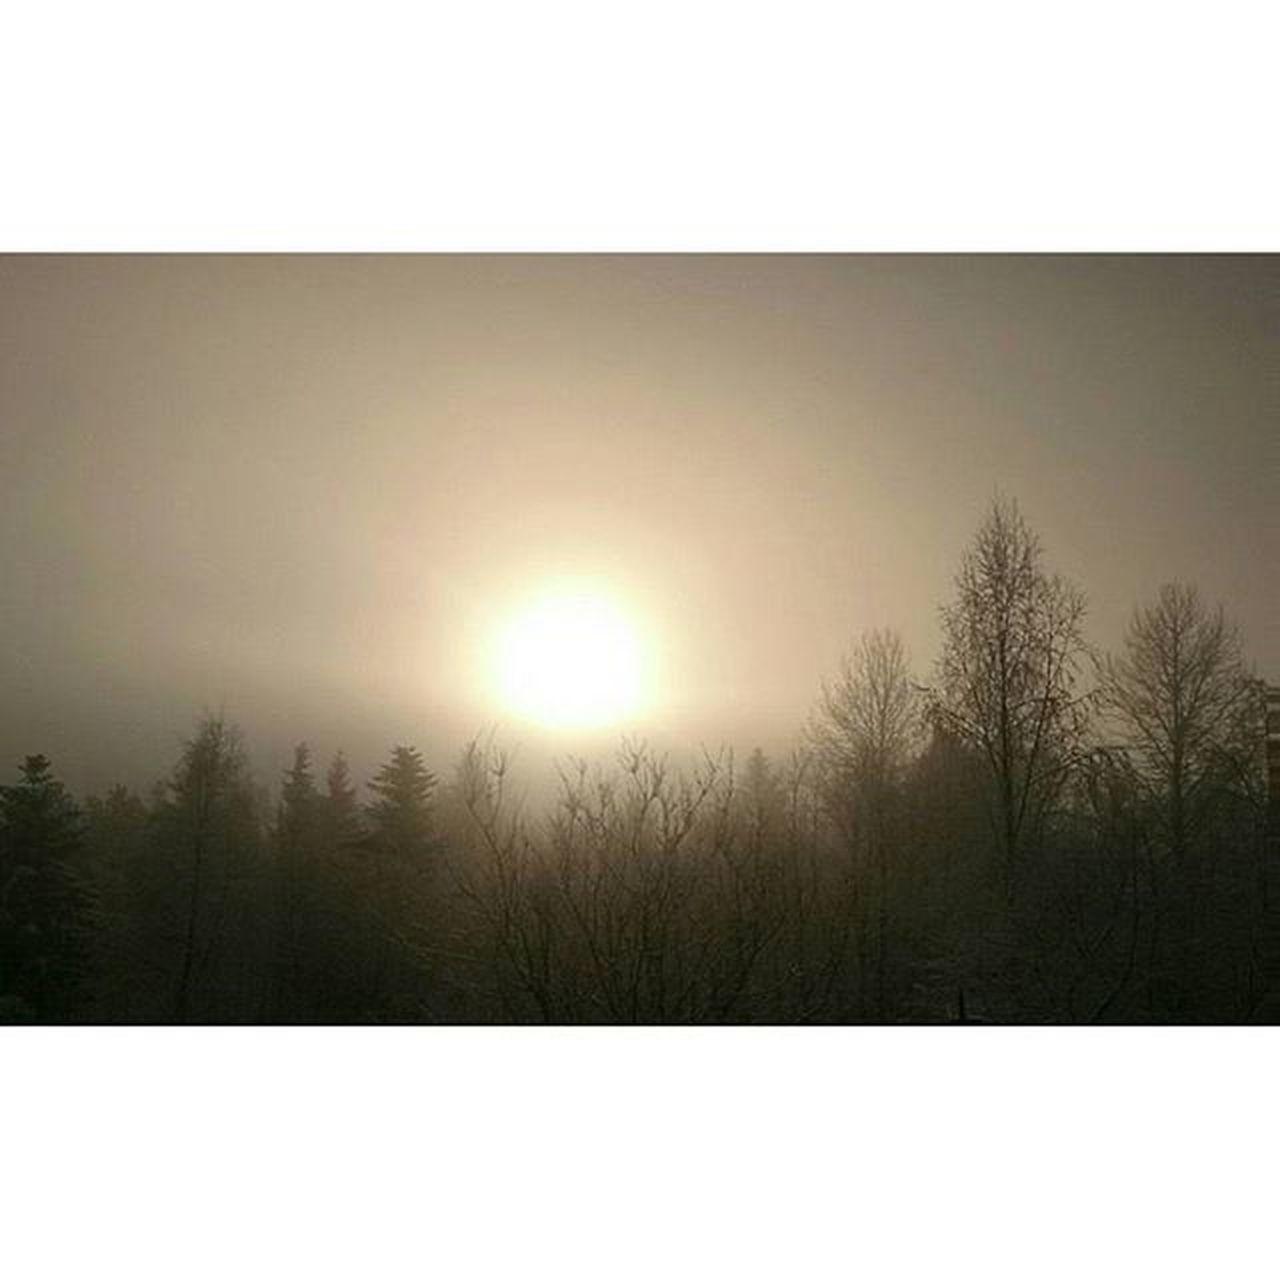 Rendalen Take Dis Natur Nature Fog Clouds Sun Breakthrough Sol Sunrise Nofilter Gråvær Ilovenorway Visithedmark Visitnorway Norgeibilder Iwokeuplikethis Utno Likeettervardetknallvær Idyll Grått Grey Latergram